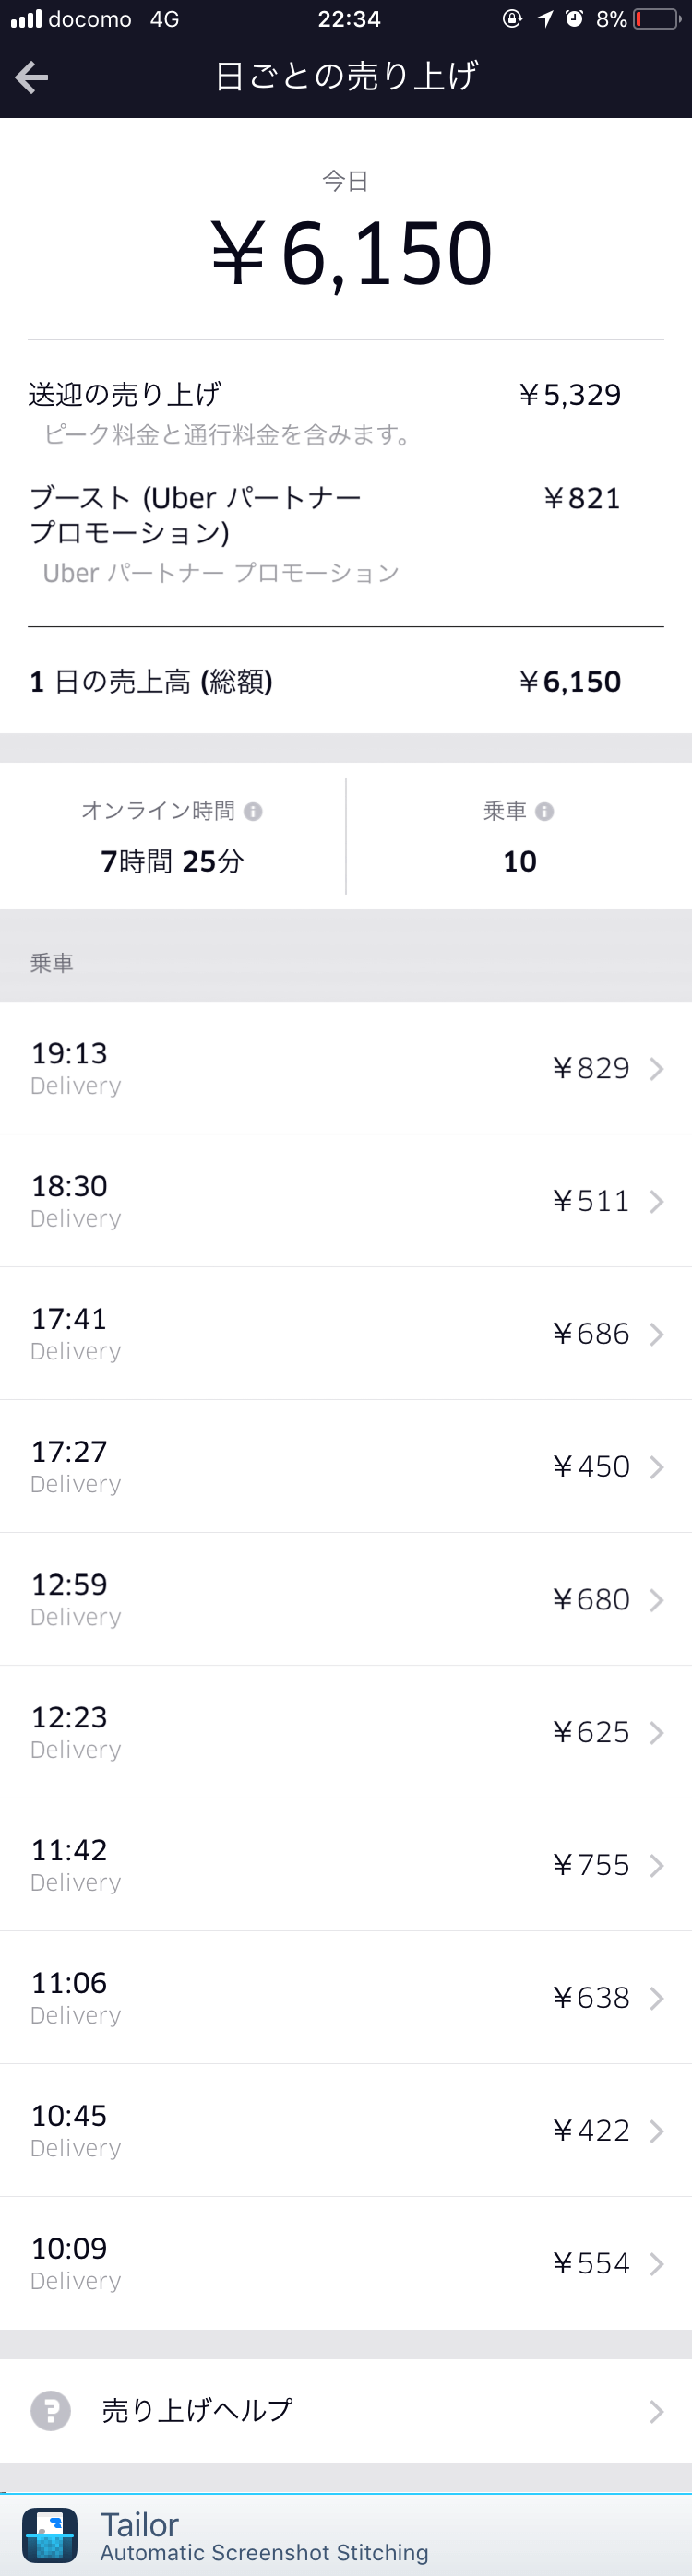 Uber Eats配達5日目の売上数字